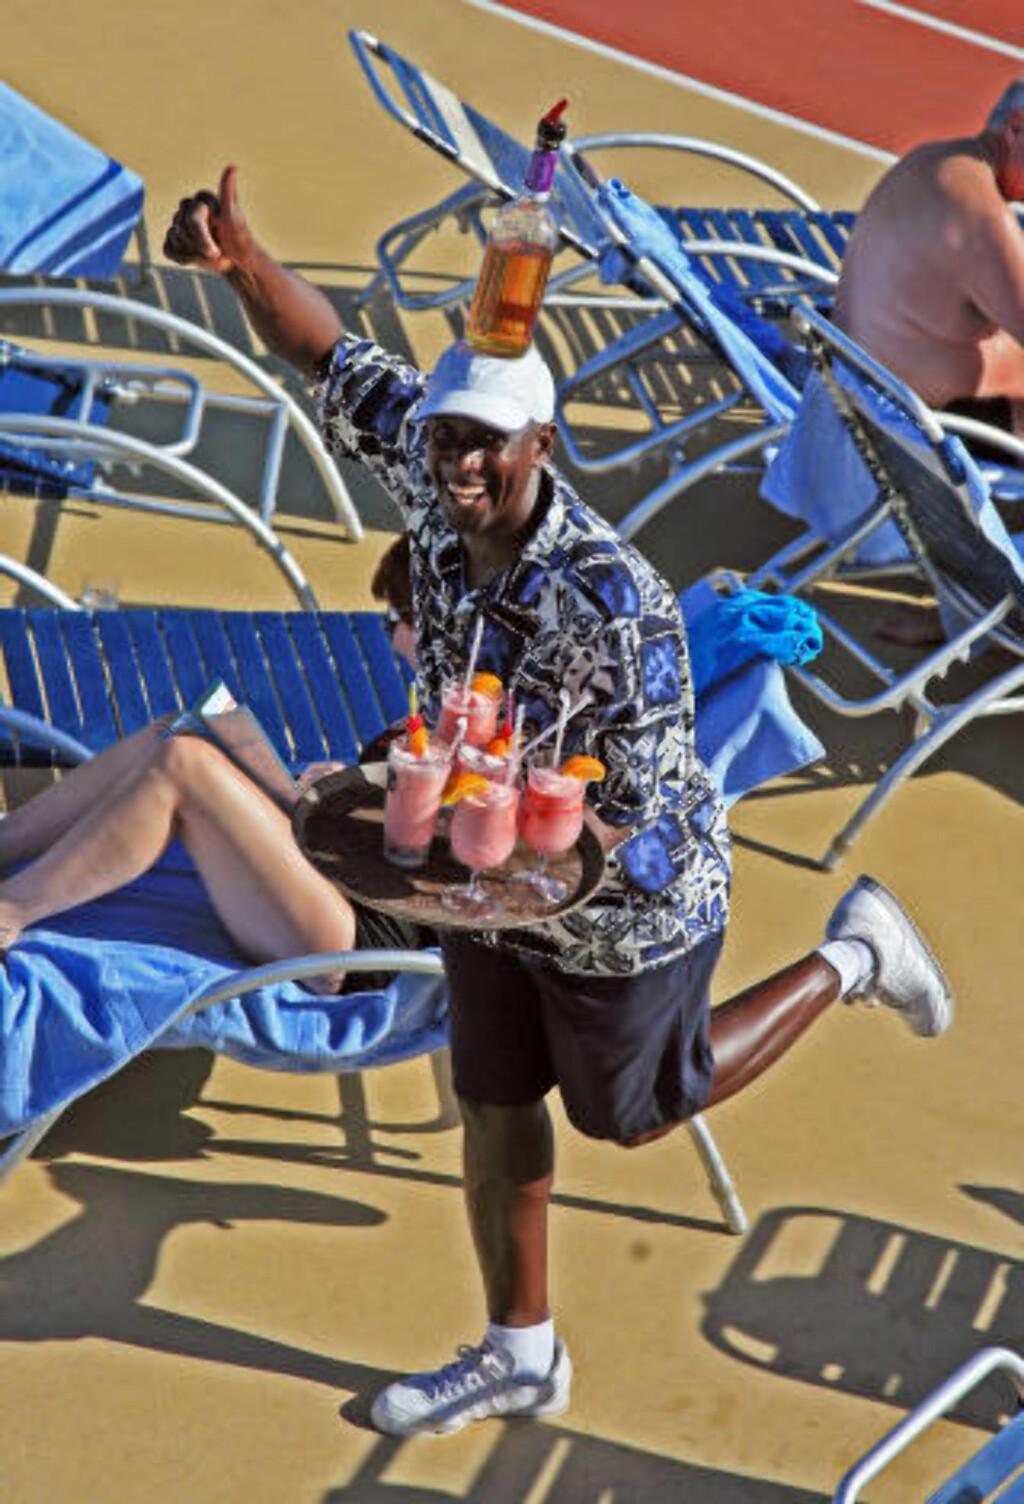 Celebrity Silhouette Cruise Review for Cabin 1504 - cruizr.com